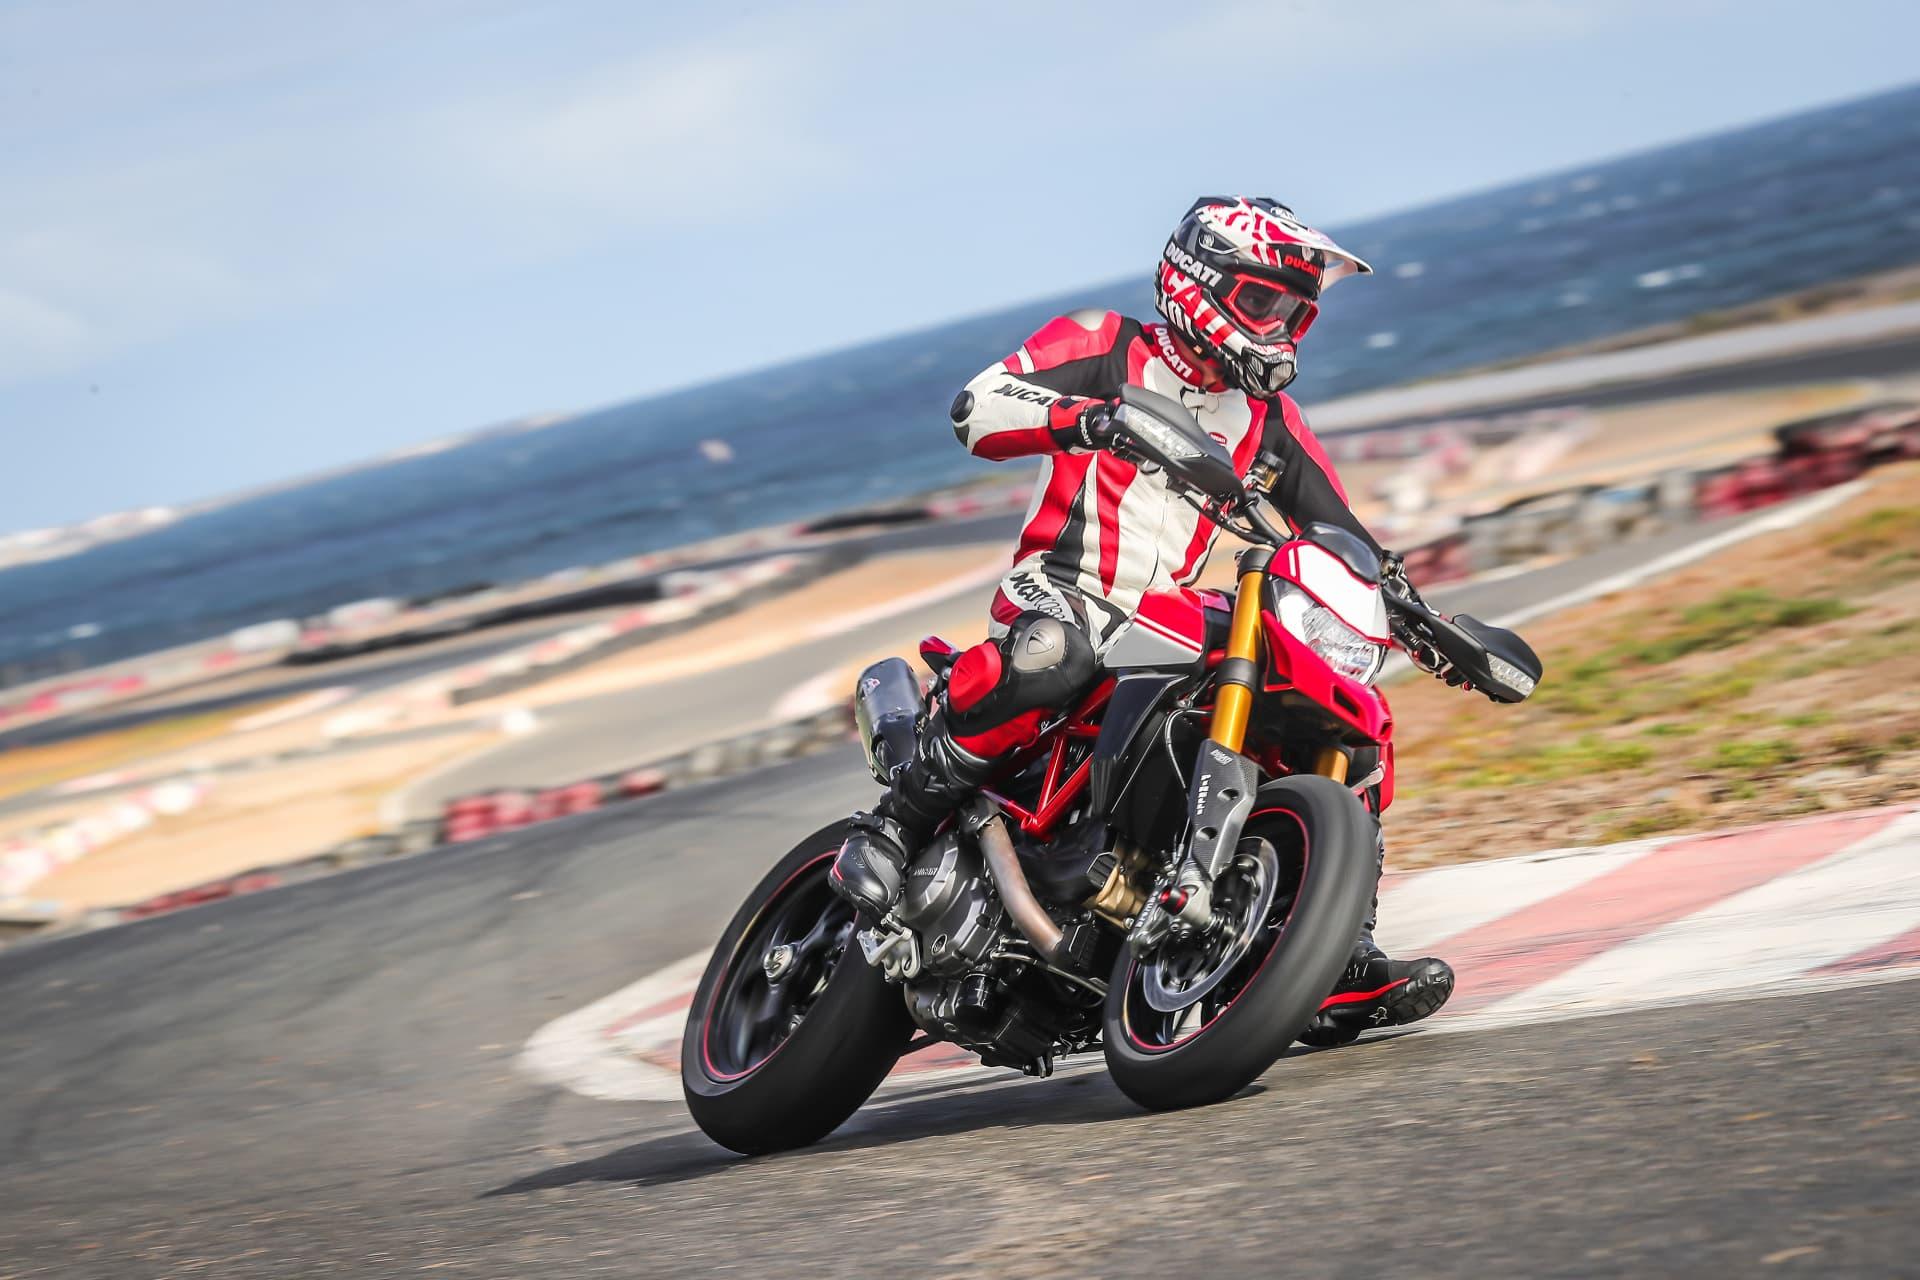 Ducati Hypermotard 950 Sp Performance 08 Uc70336 Mid